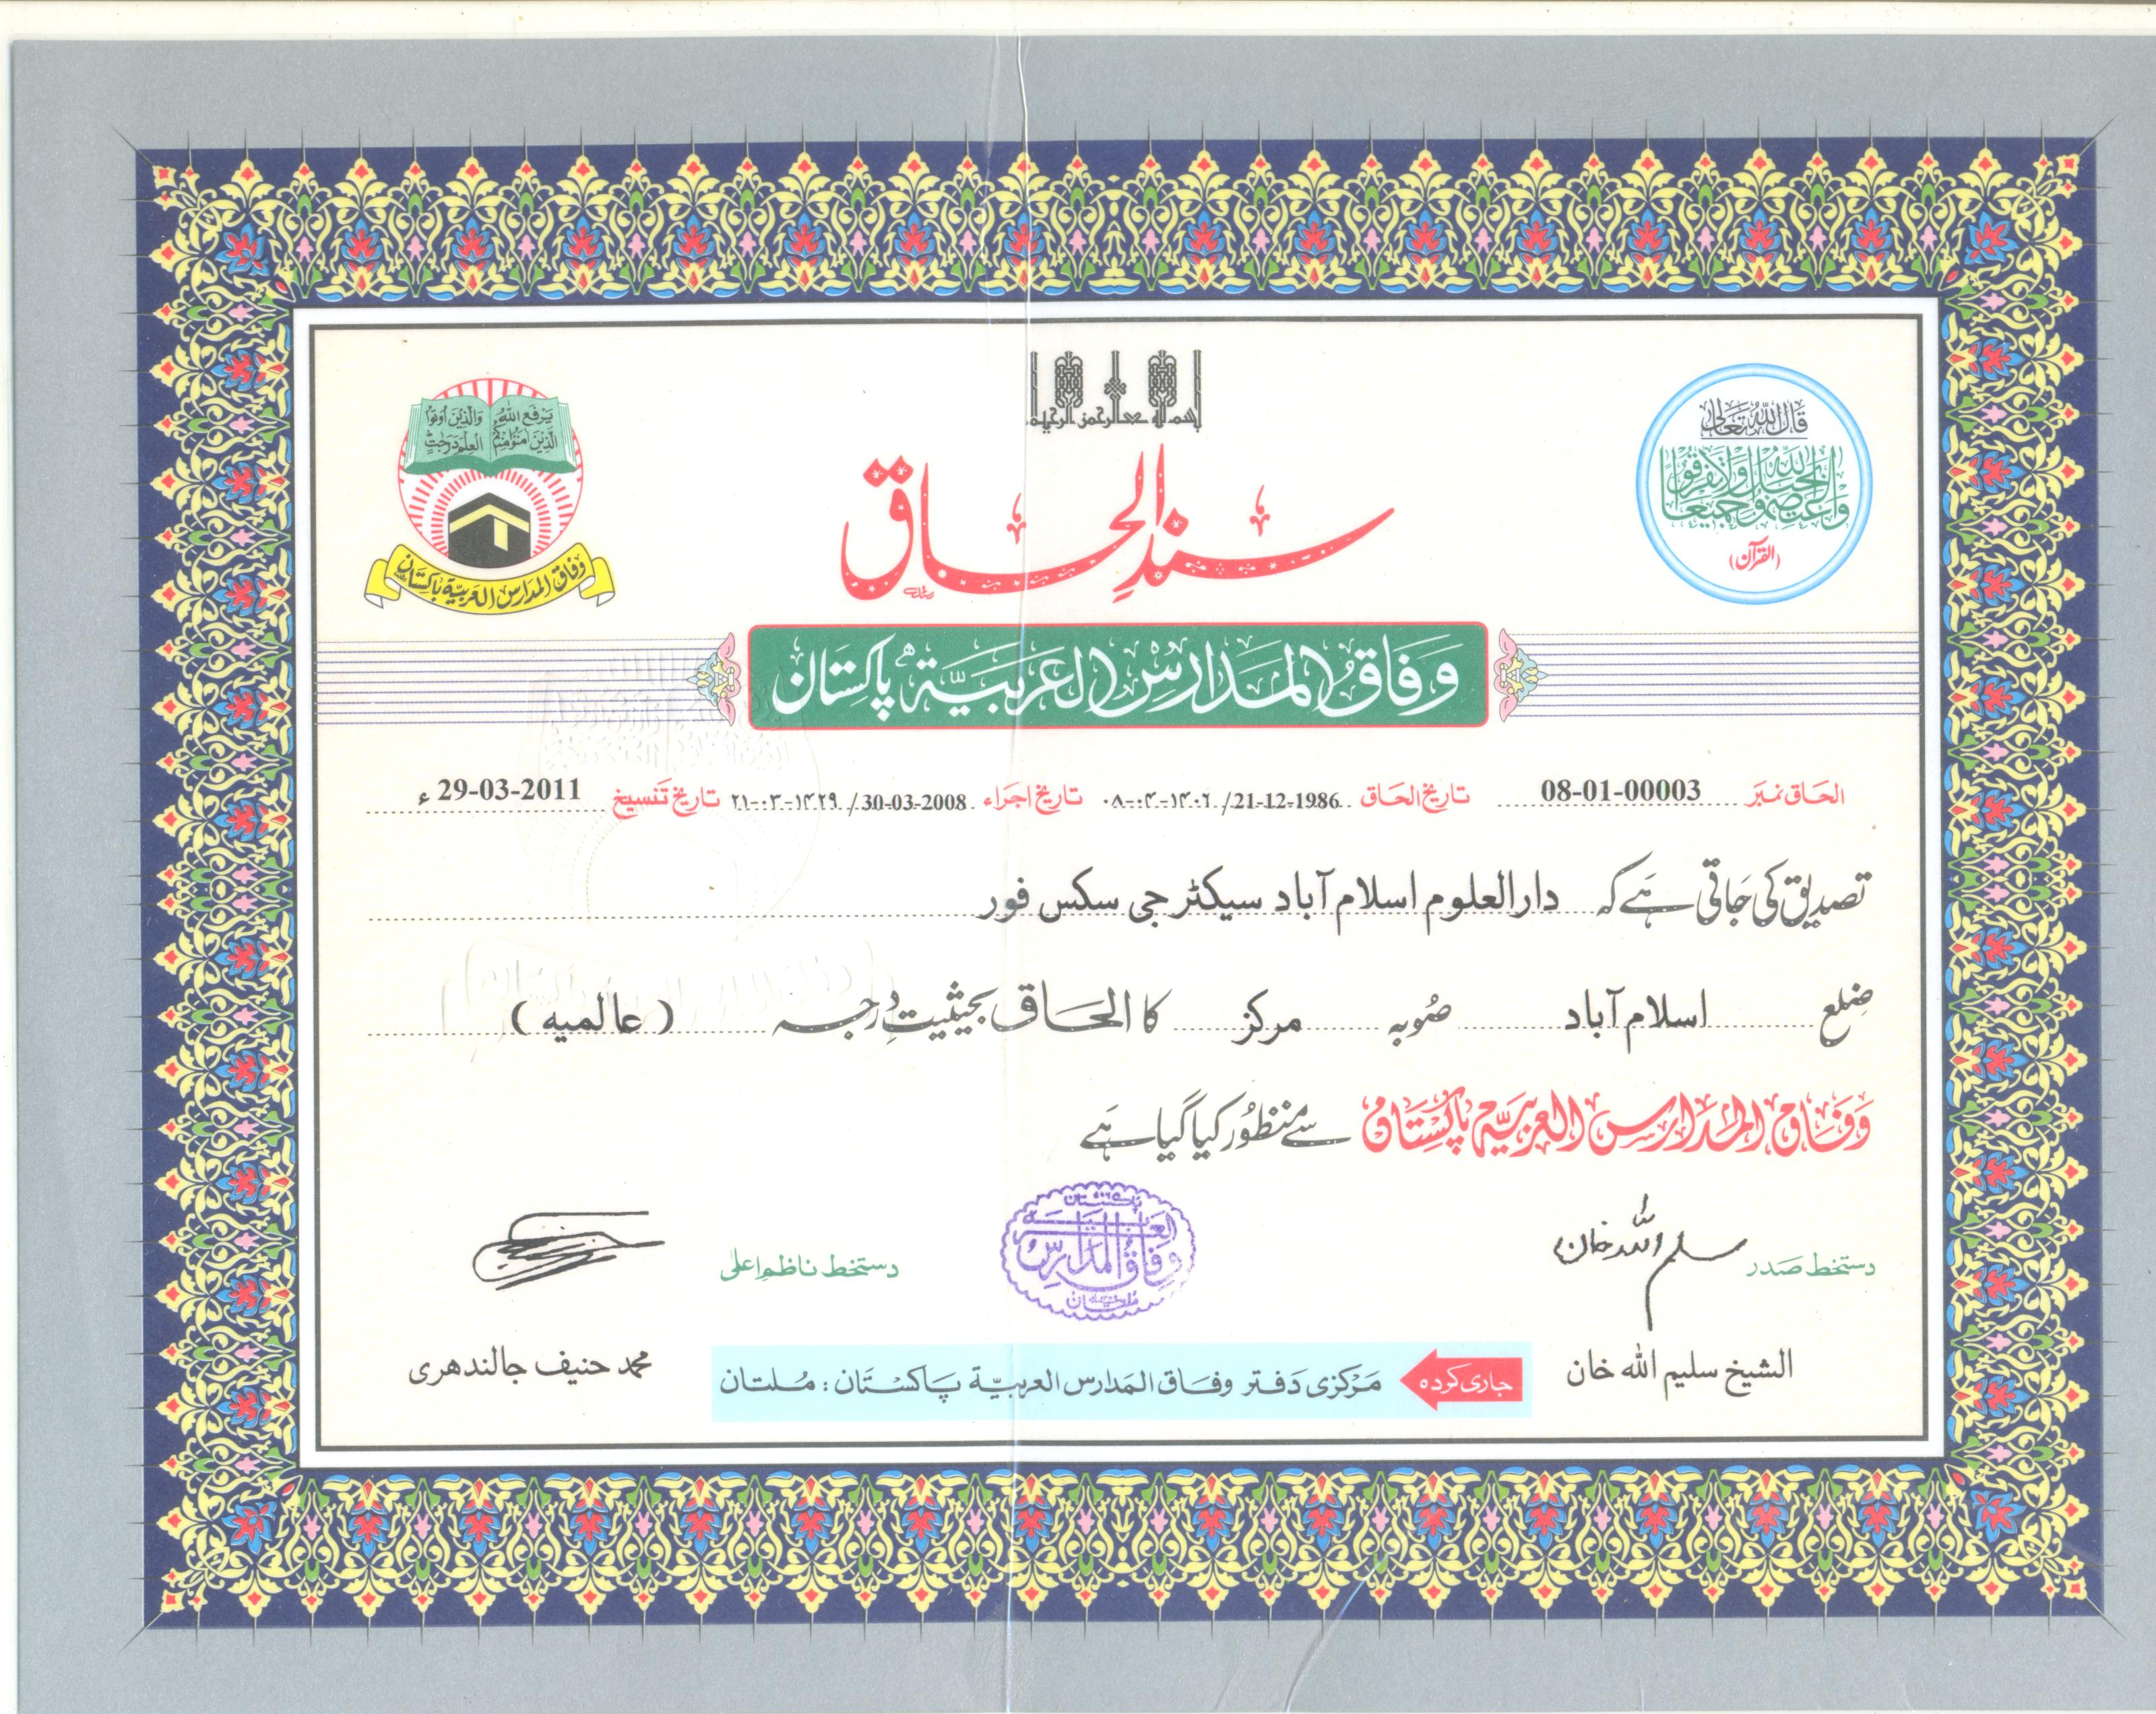 DARUL ULOOM ISLAMABAD (Regd.) » Important reading